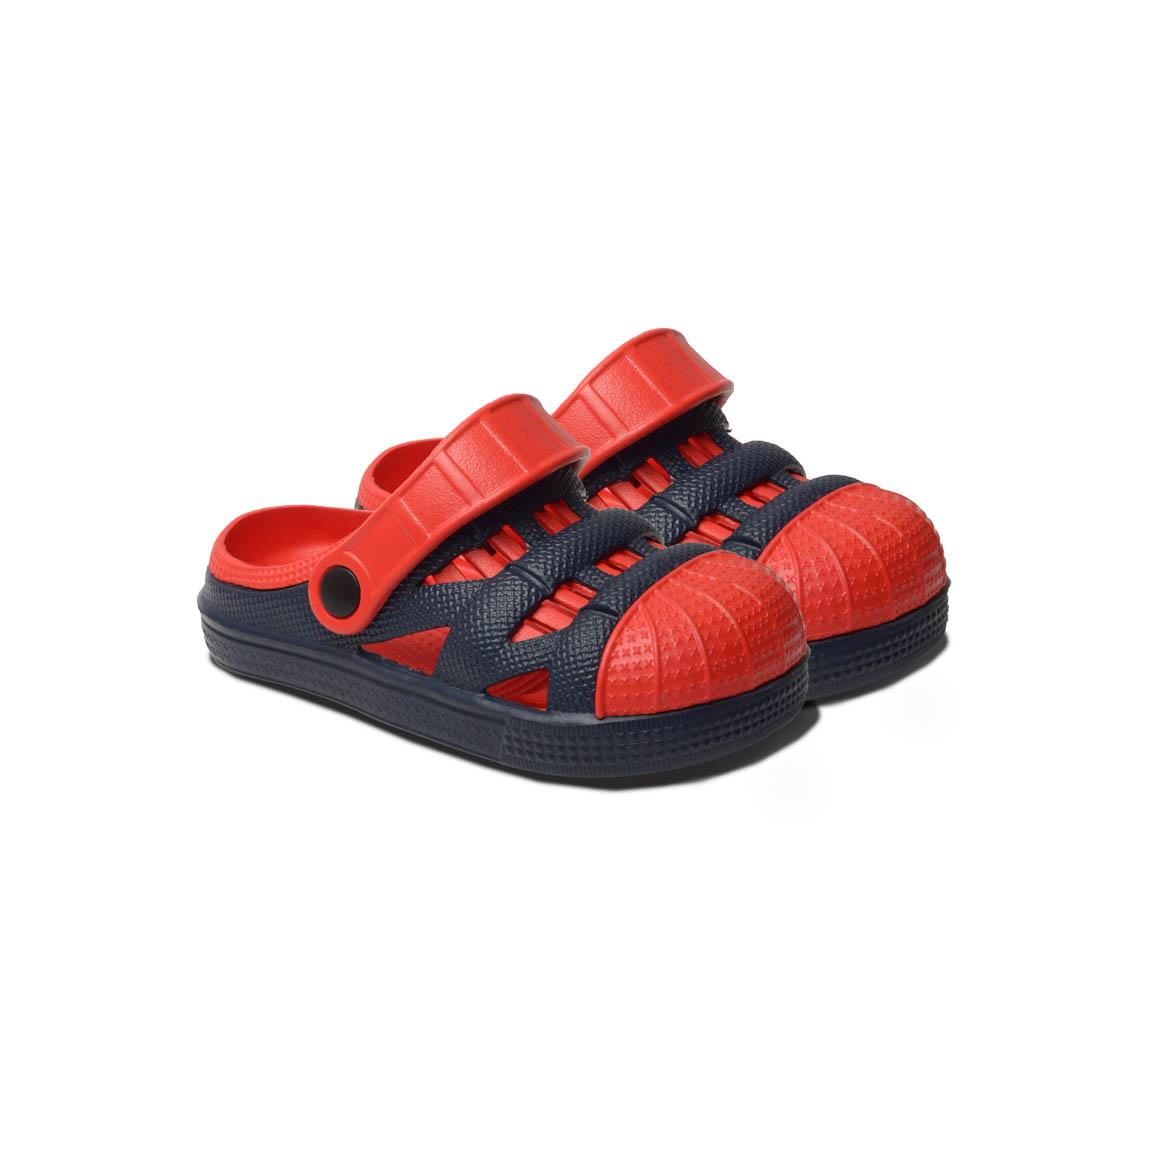 Kids Lightweight Sandals - Navy/Red | Trada Marketplace